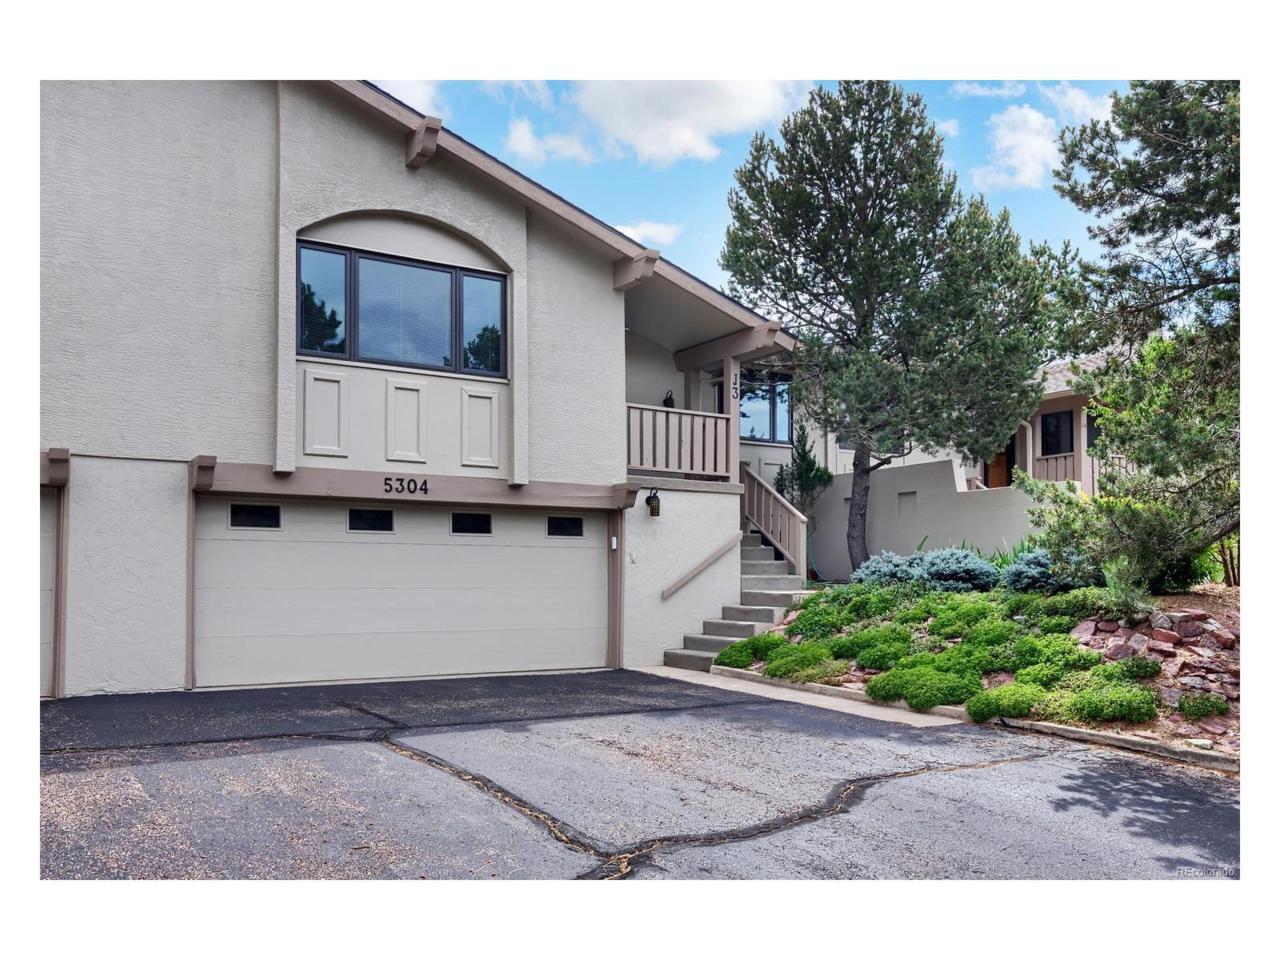 5304 Kissing Camels Drive #3, Colorado Springs, CO 80904 (MLS #2654550) :: 8z Real Estate